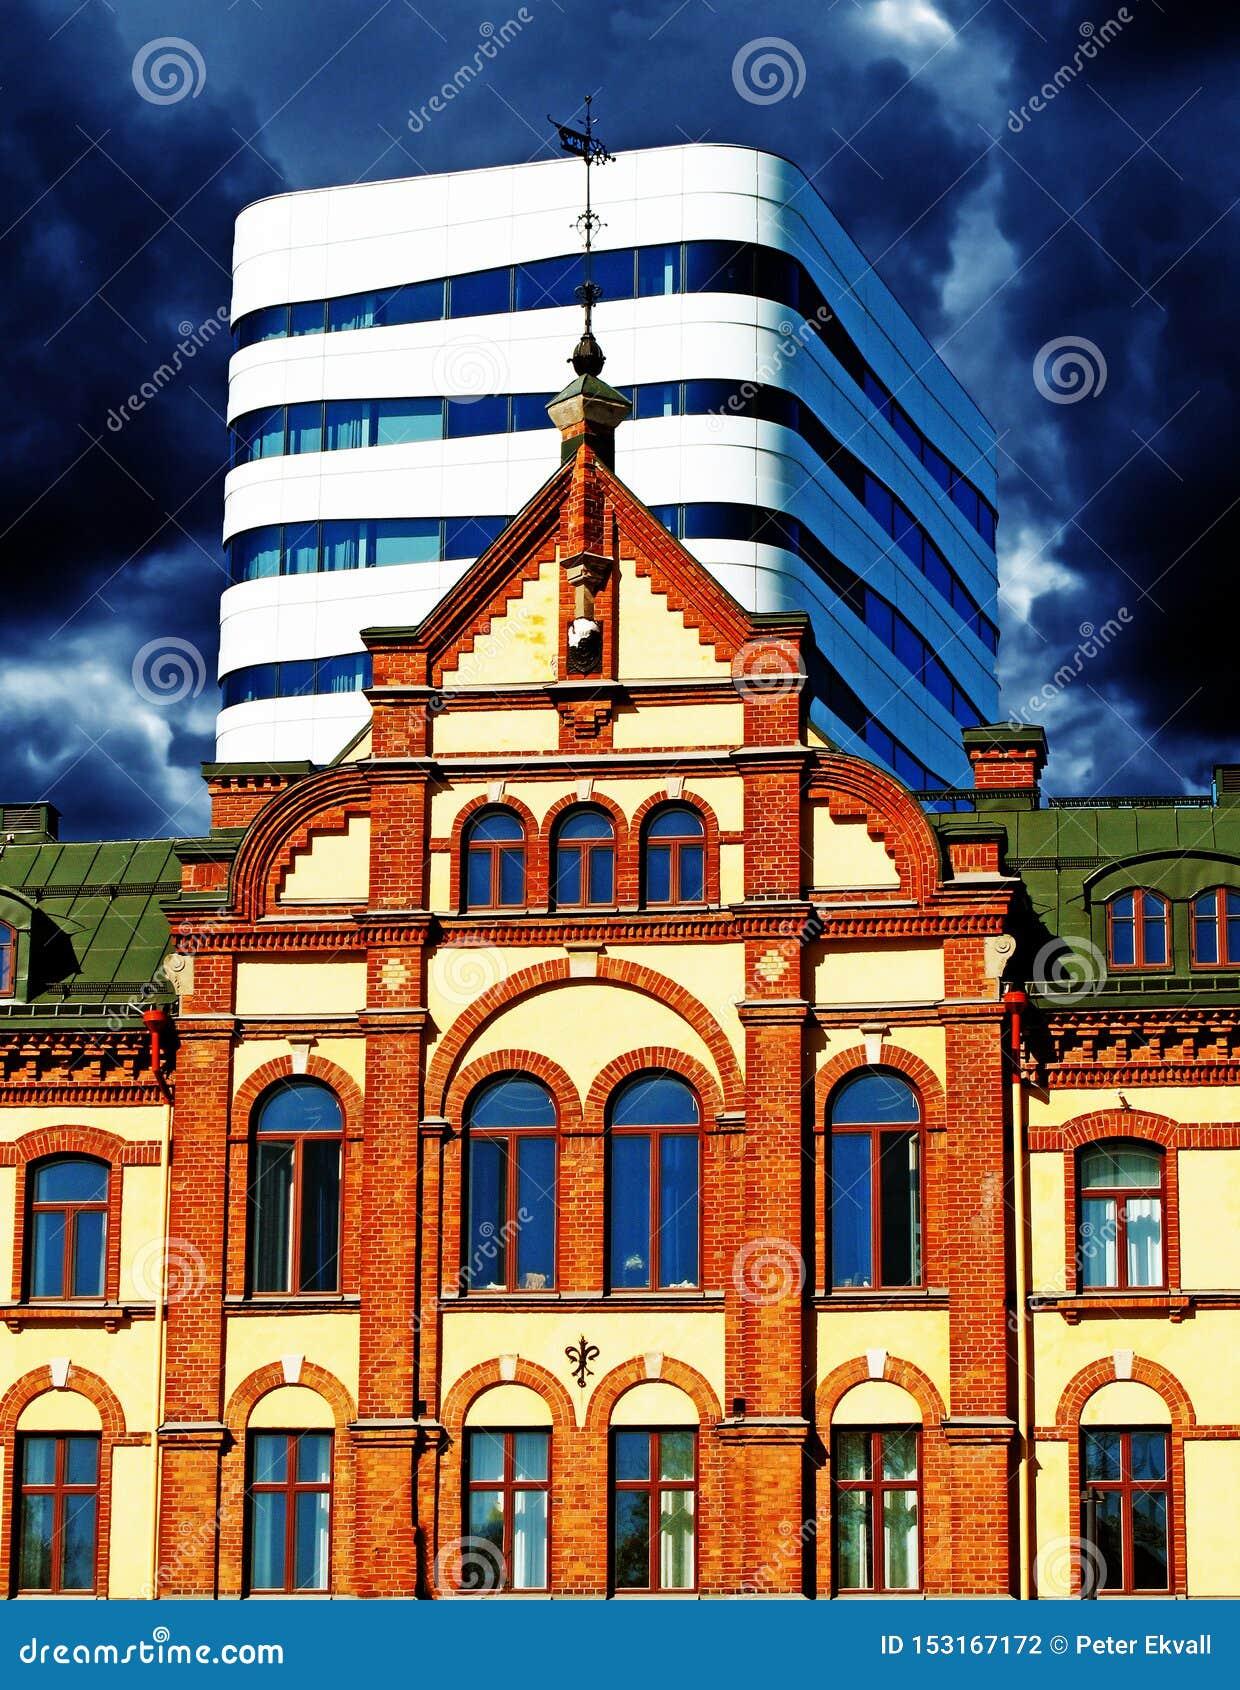 Umea, Swedmodern και παλαιό σπίτι στην ίδιες εικόνα και τη θύελλα στο υπόβαθρο